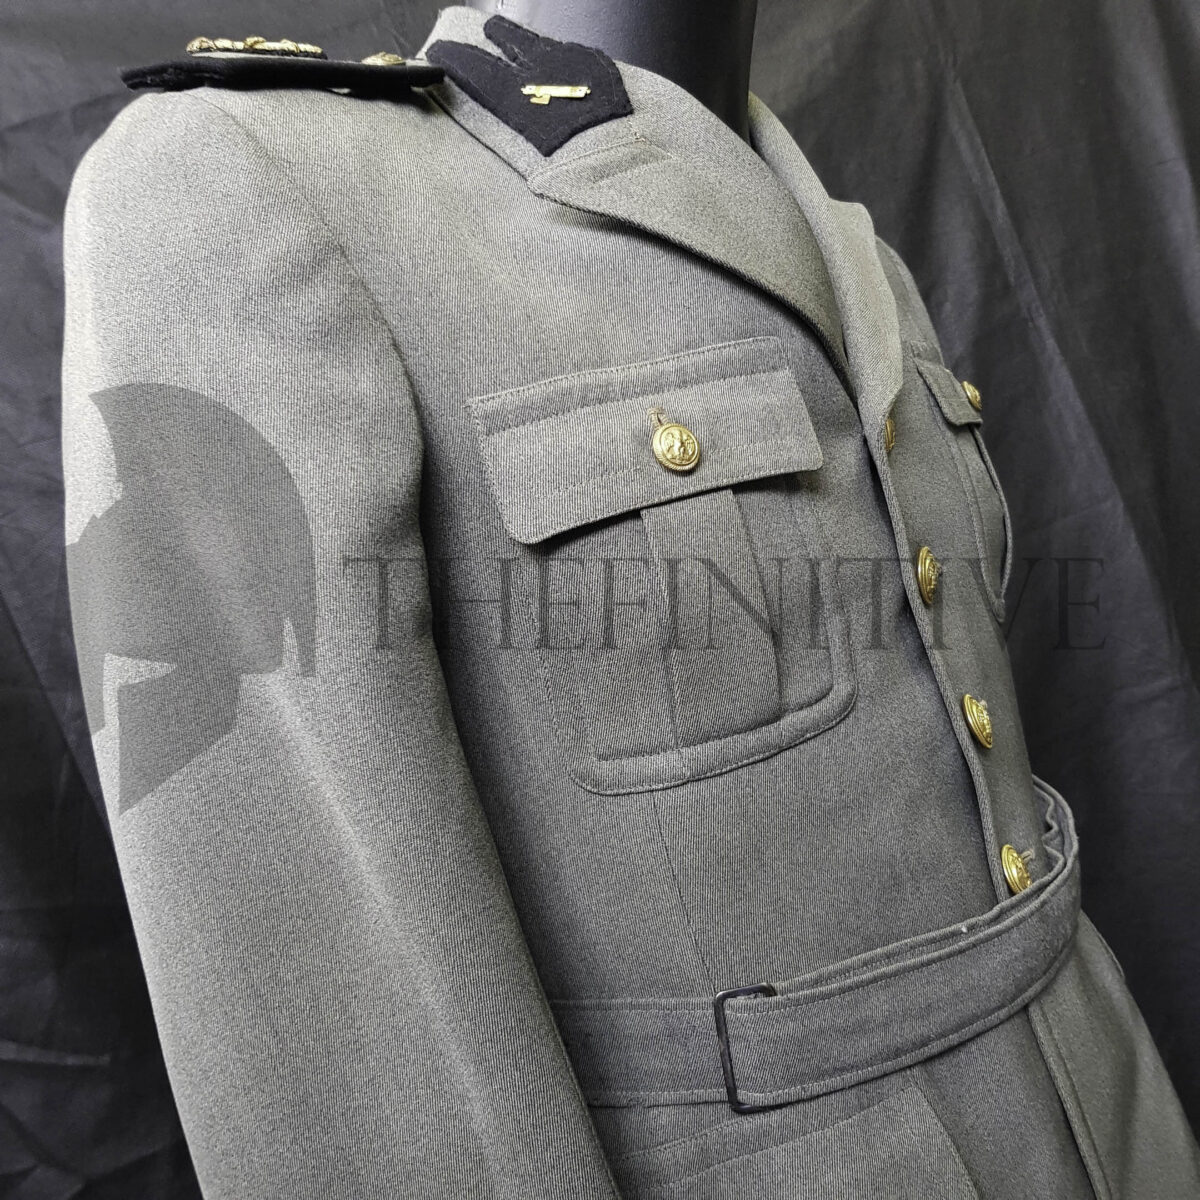 Uniforme MVSN Milizia Volontaria